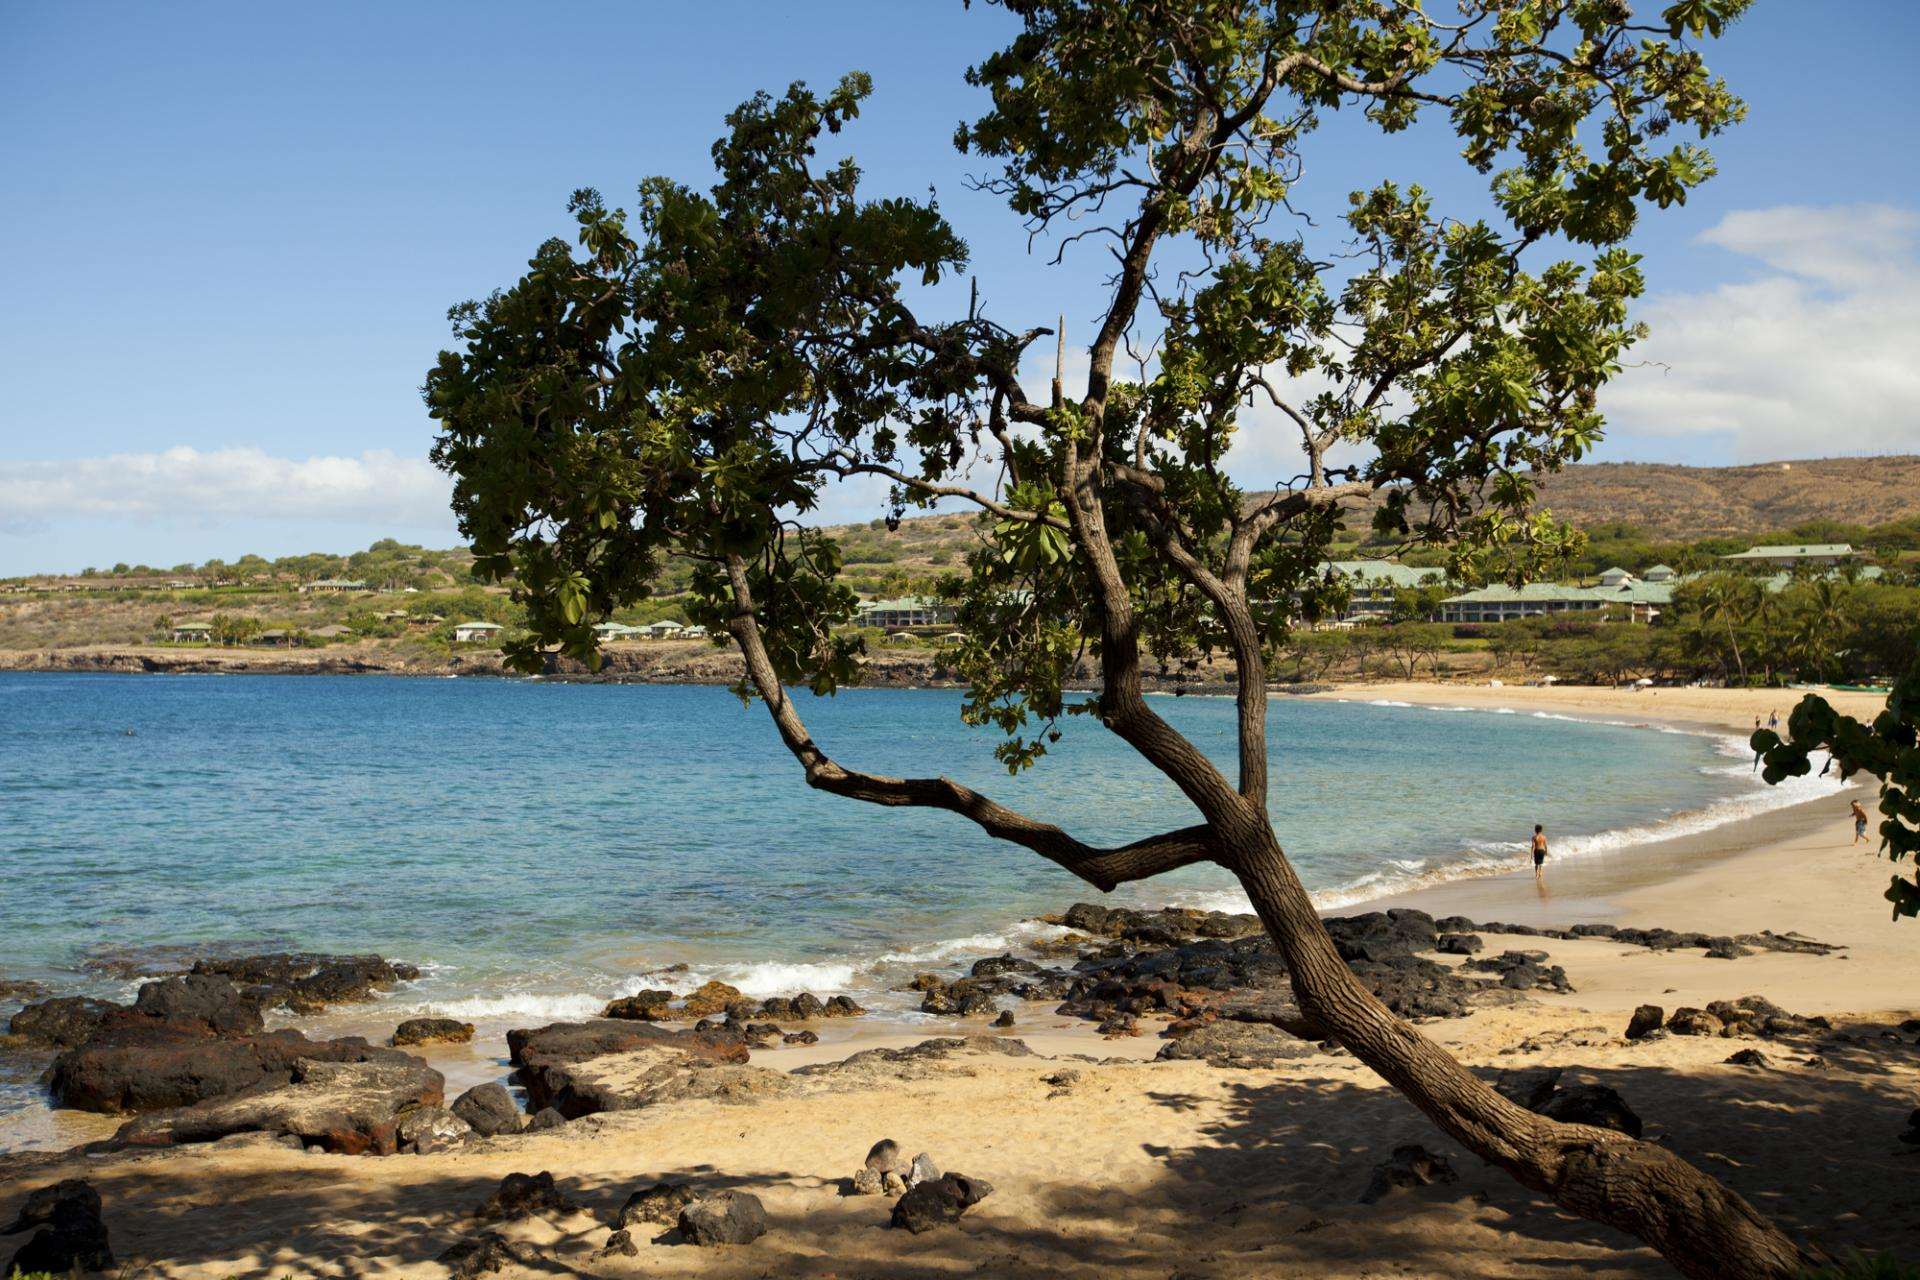 Scenic beach on the Hawaiian island of Lanai